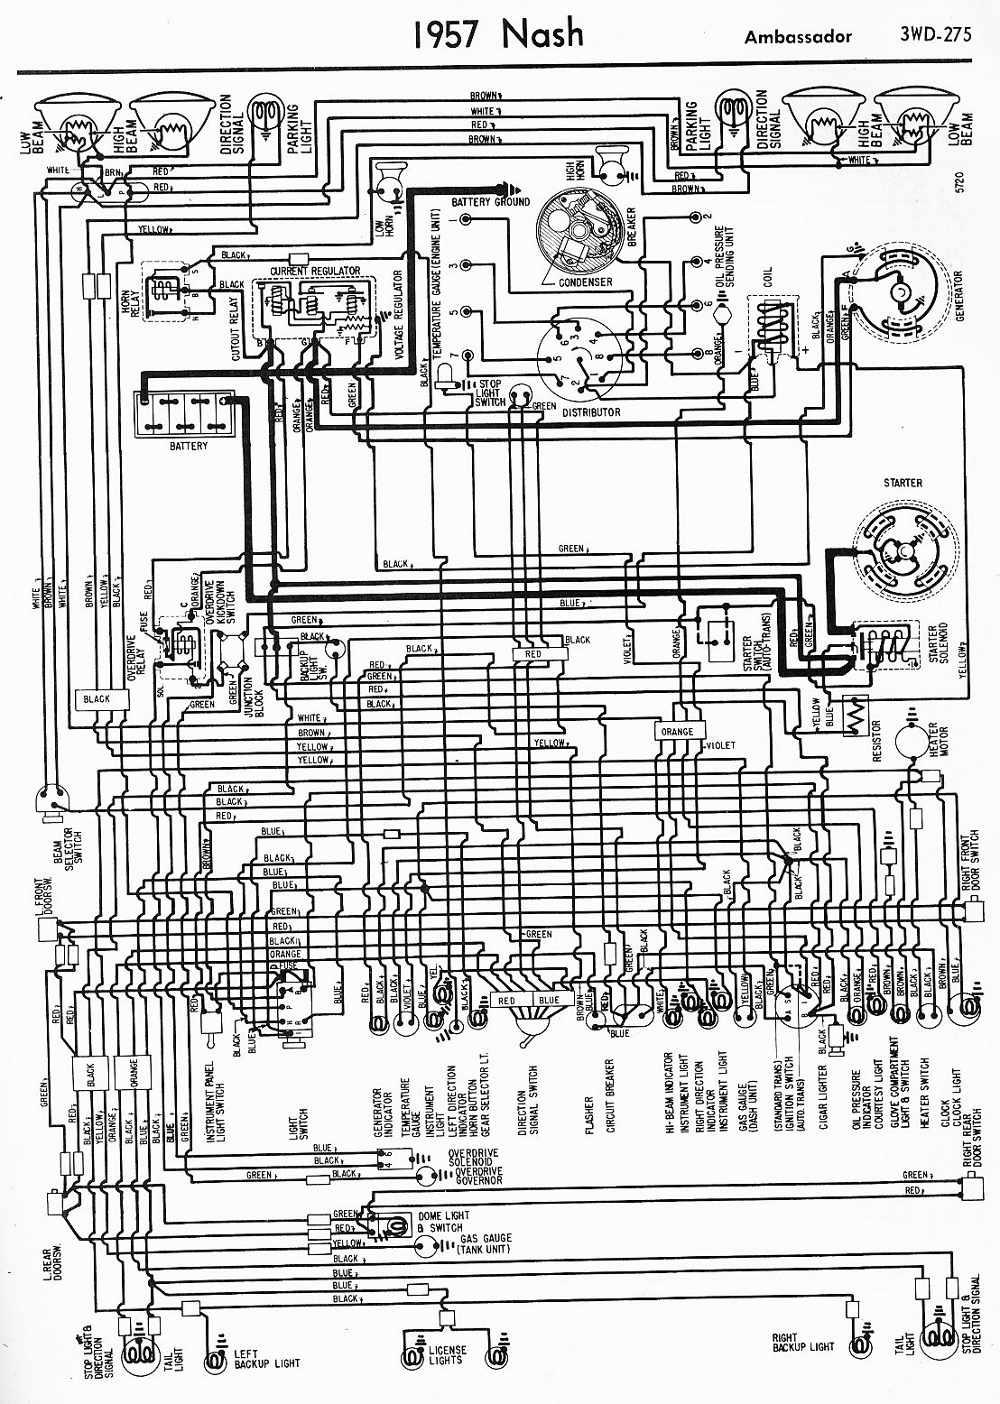 Großartig Flhx Schaltplan Fotos - Elektrische Schaltplan-Ideen ...